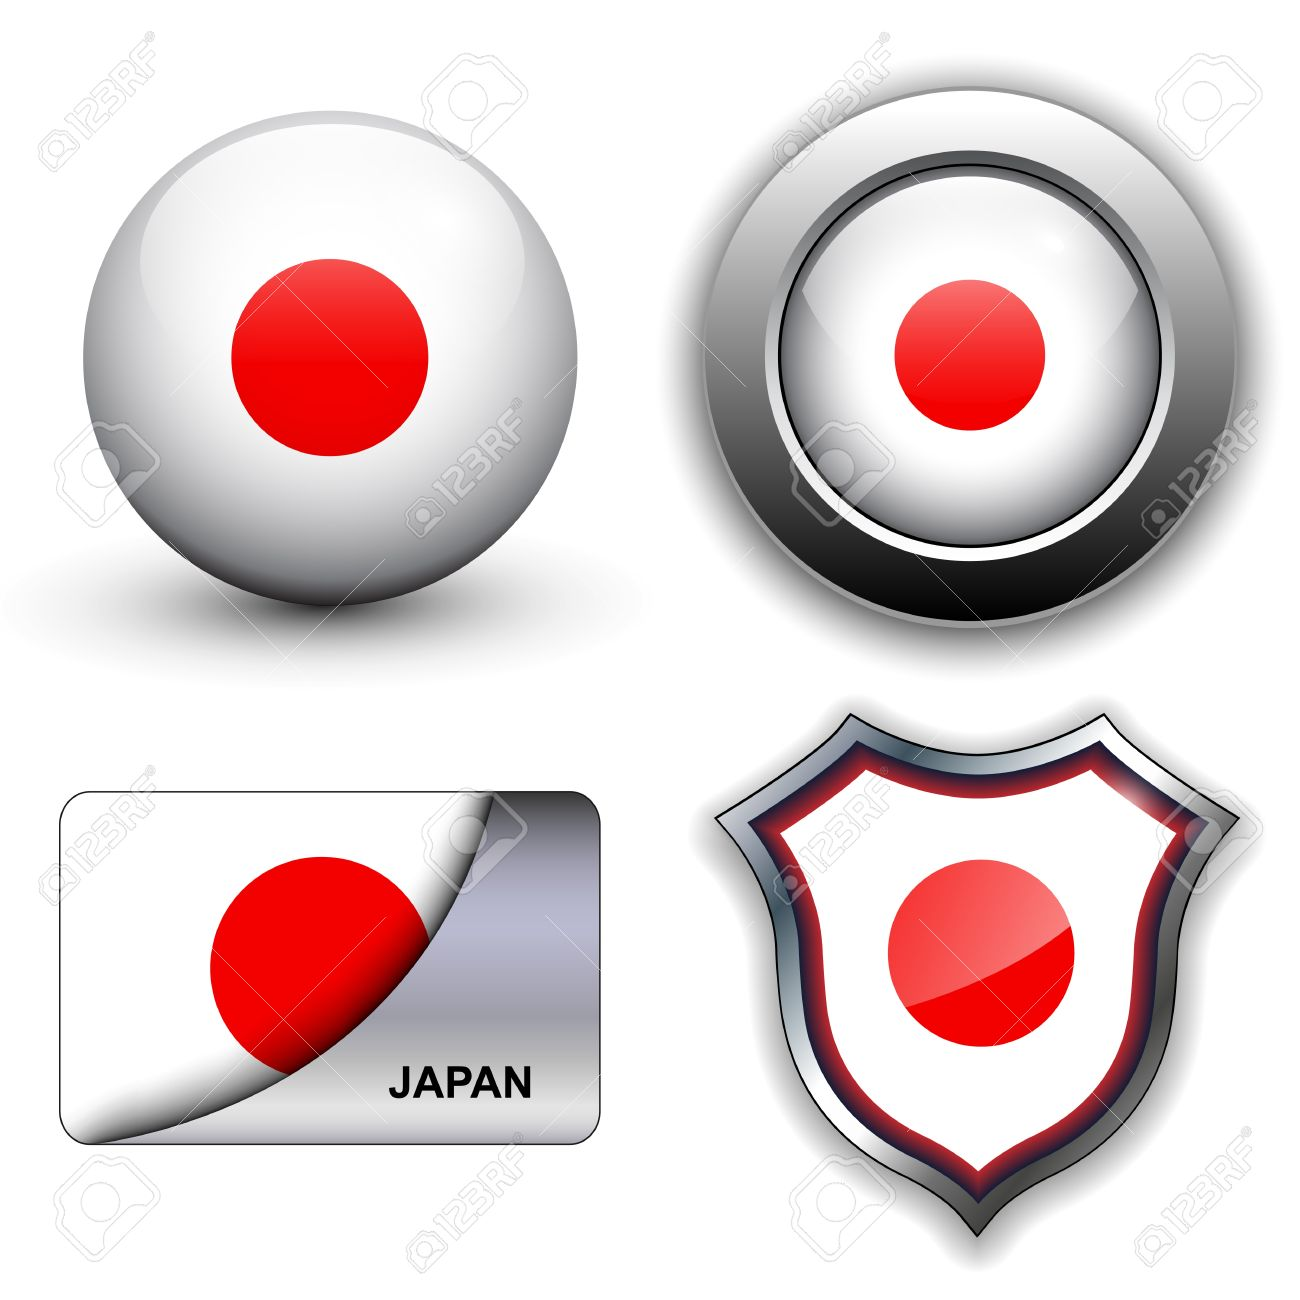 Japan flag icons theme. Stock Vector - 12905235